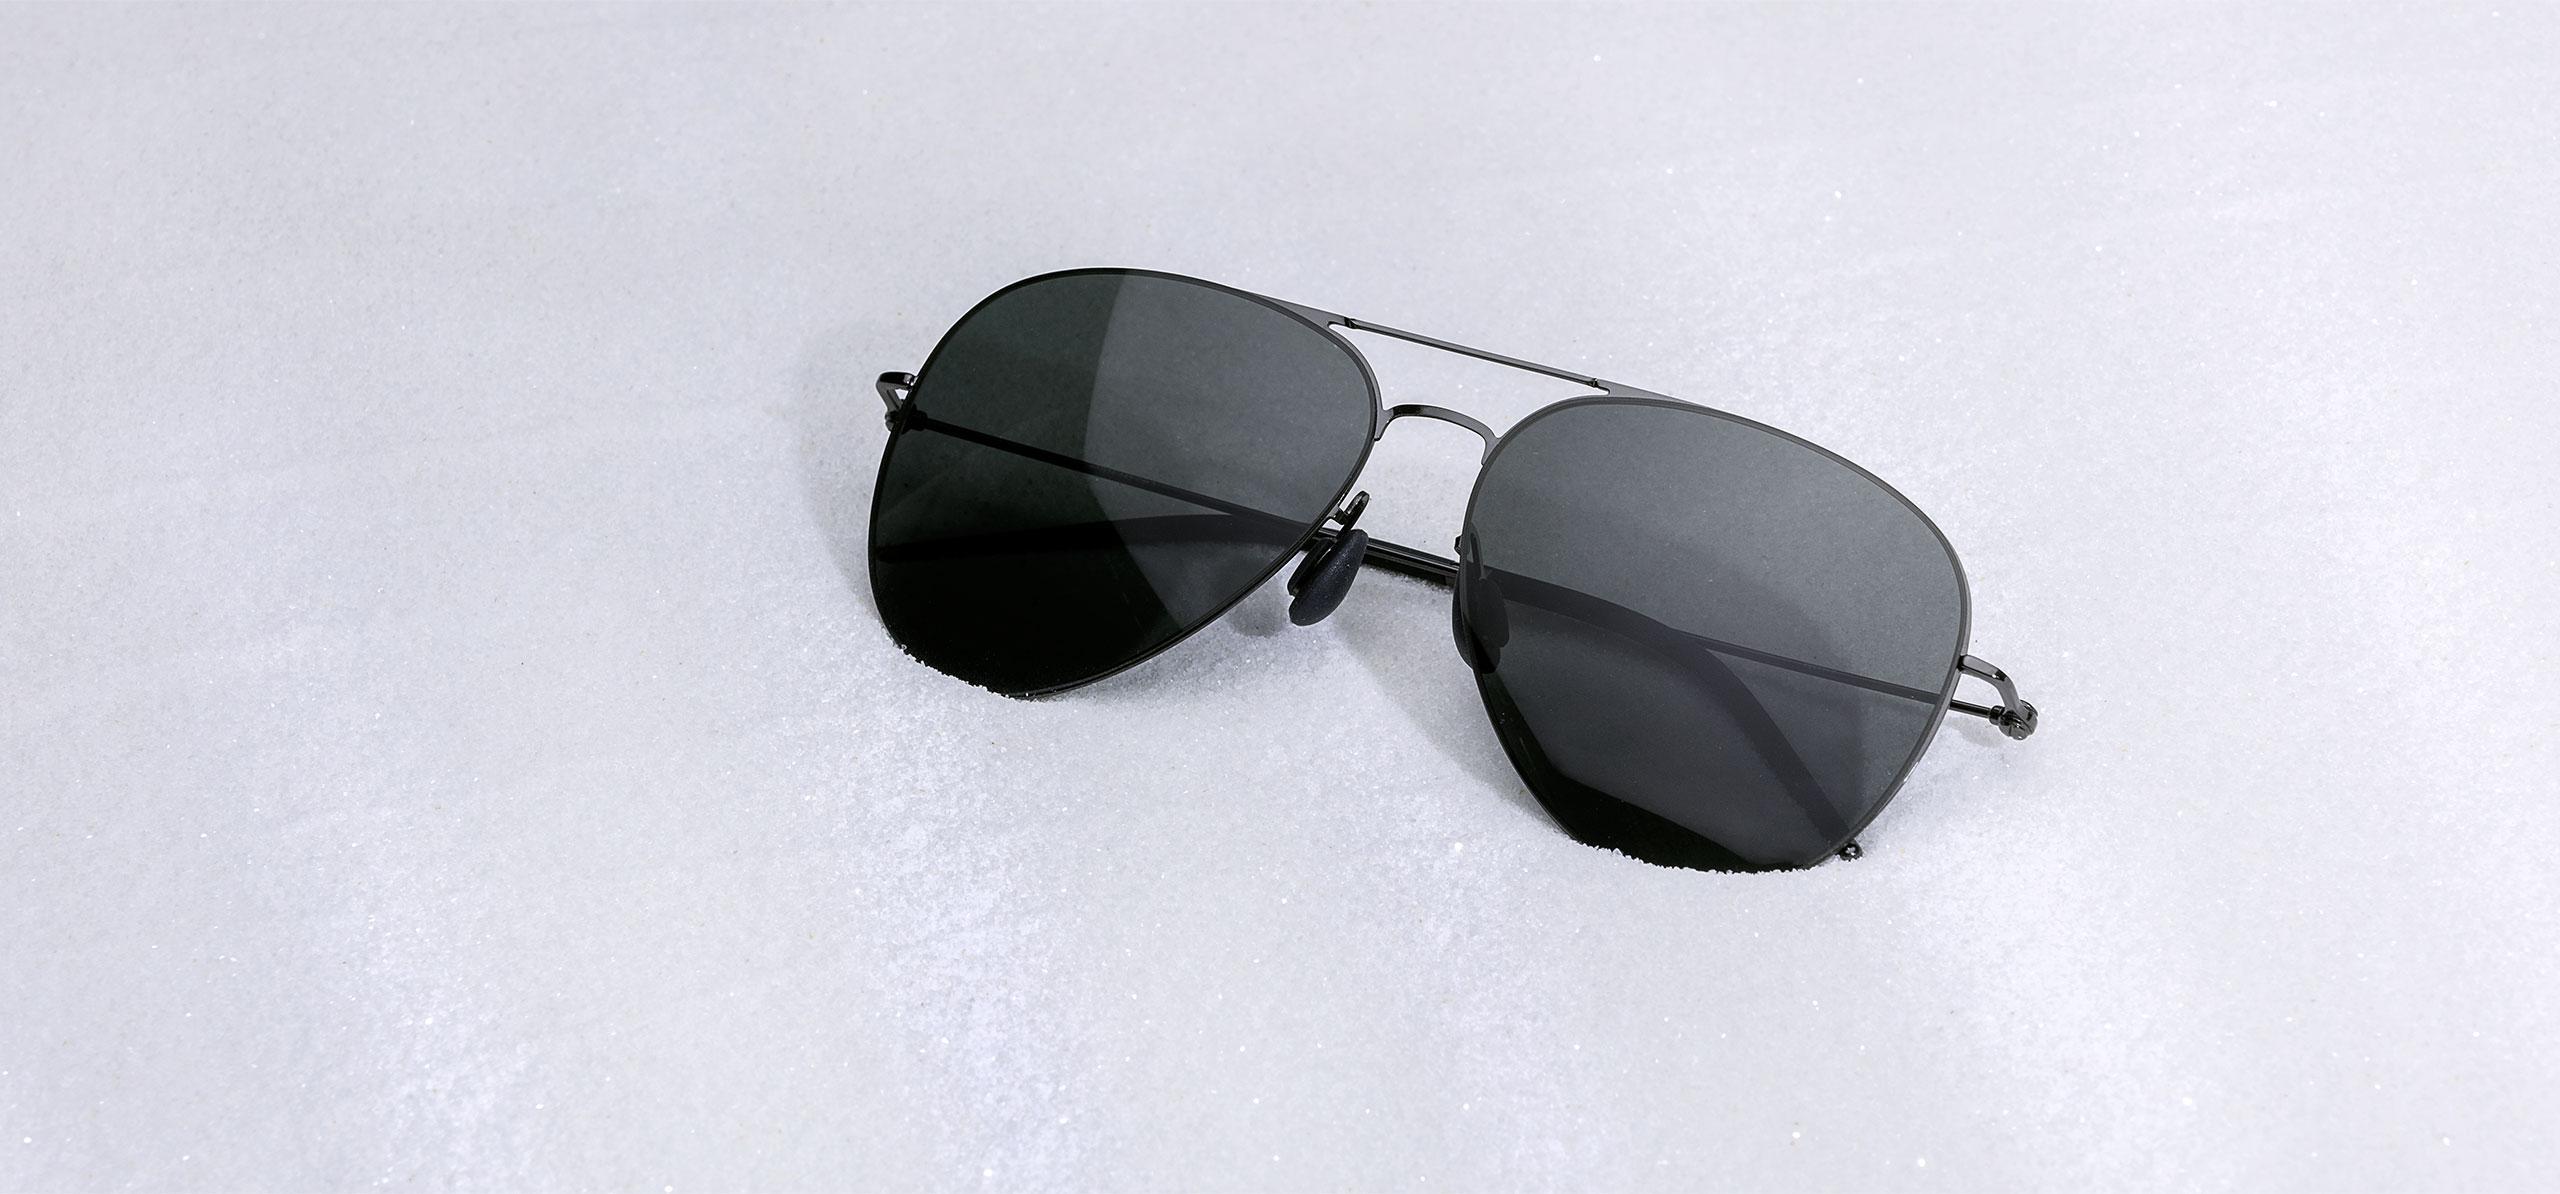 b77dbca9917 Lightweight lens material. The density of nylon polarized sunglasses ...